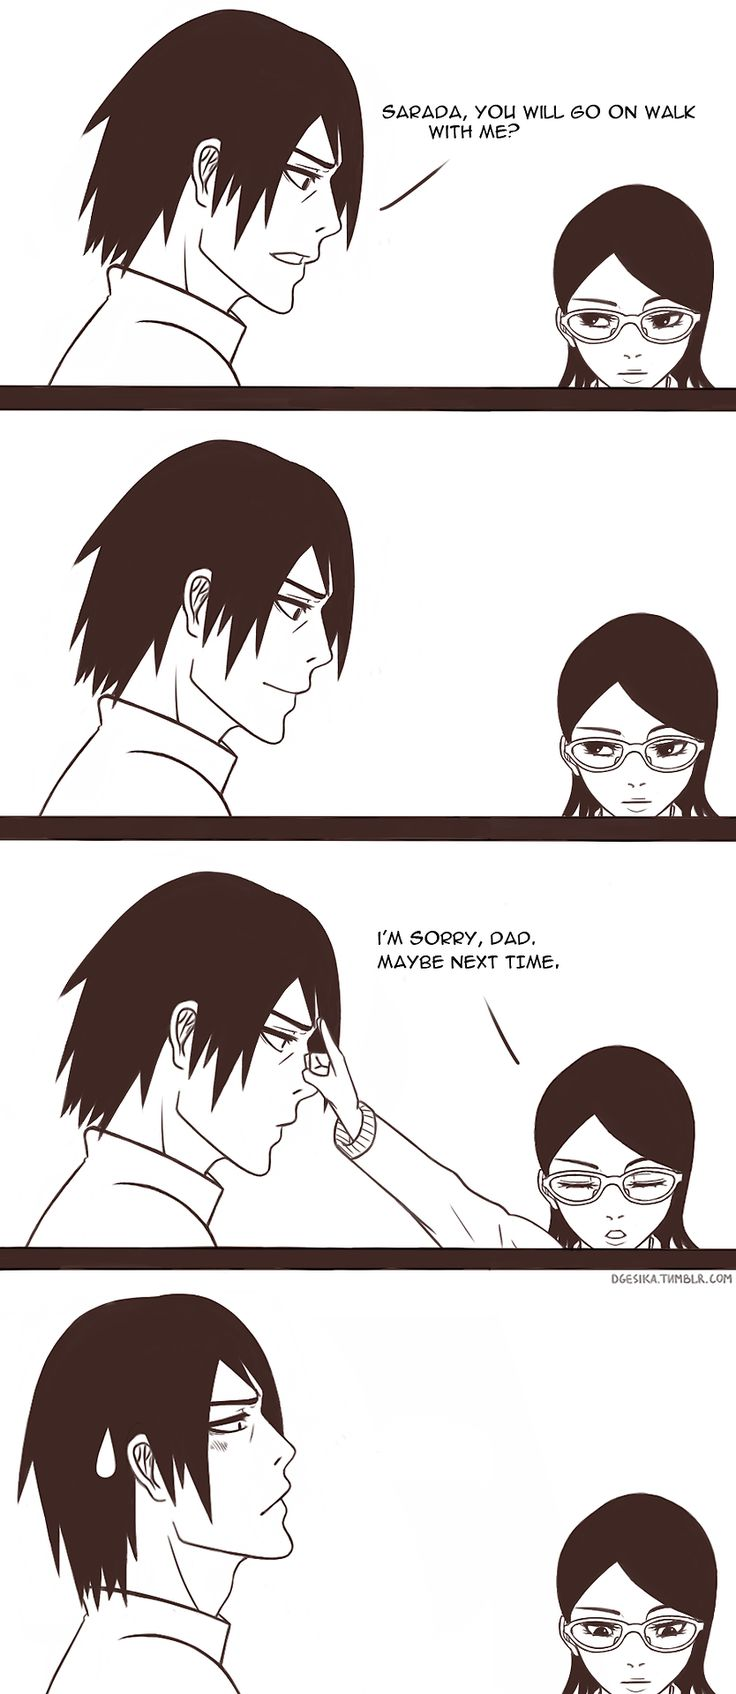 Tags: Fanart, NARUTO, Uchiha Sasuke, Comic, PNG Conversion, Tumblr, Dgesika, Uchiha Sarada